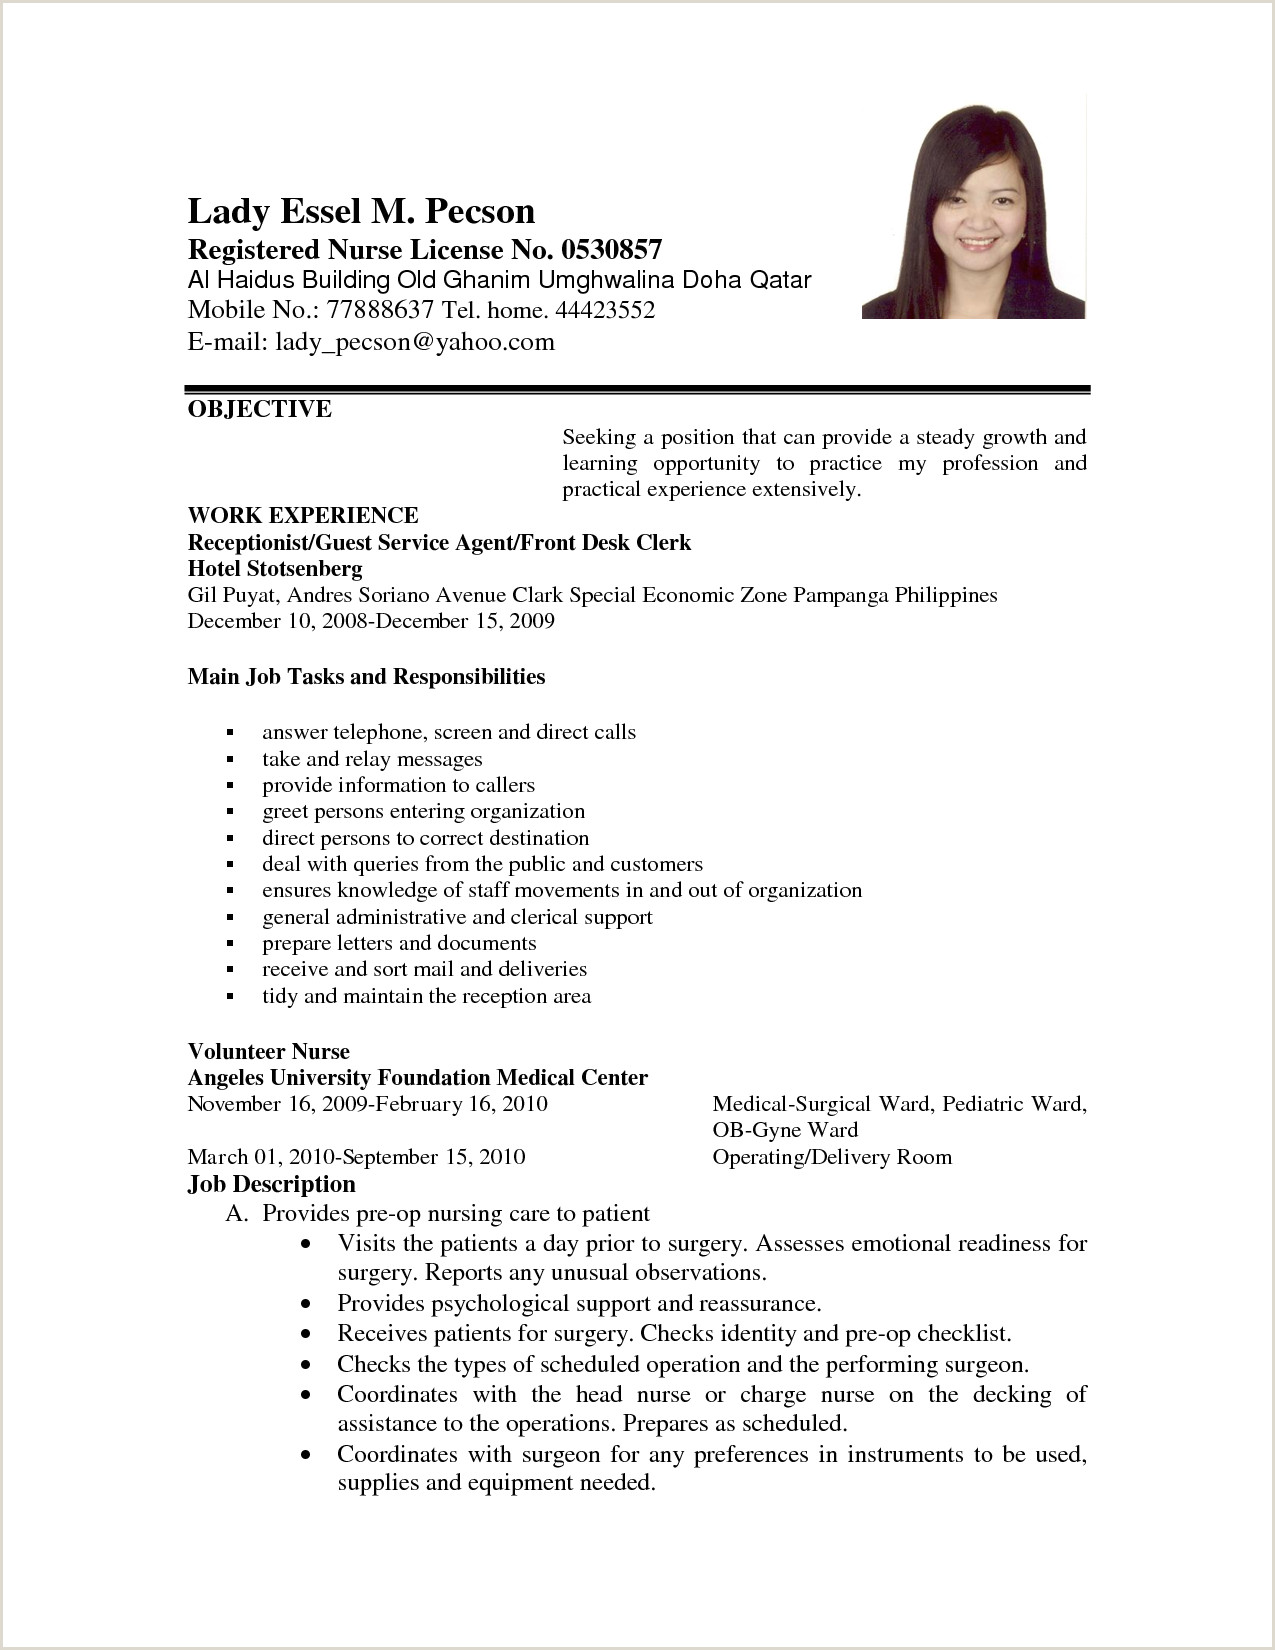 Cv Example for Hotel Job Application Letter format for Volunteer Nurse order Custom